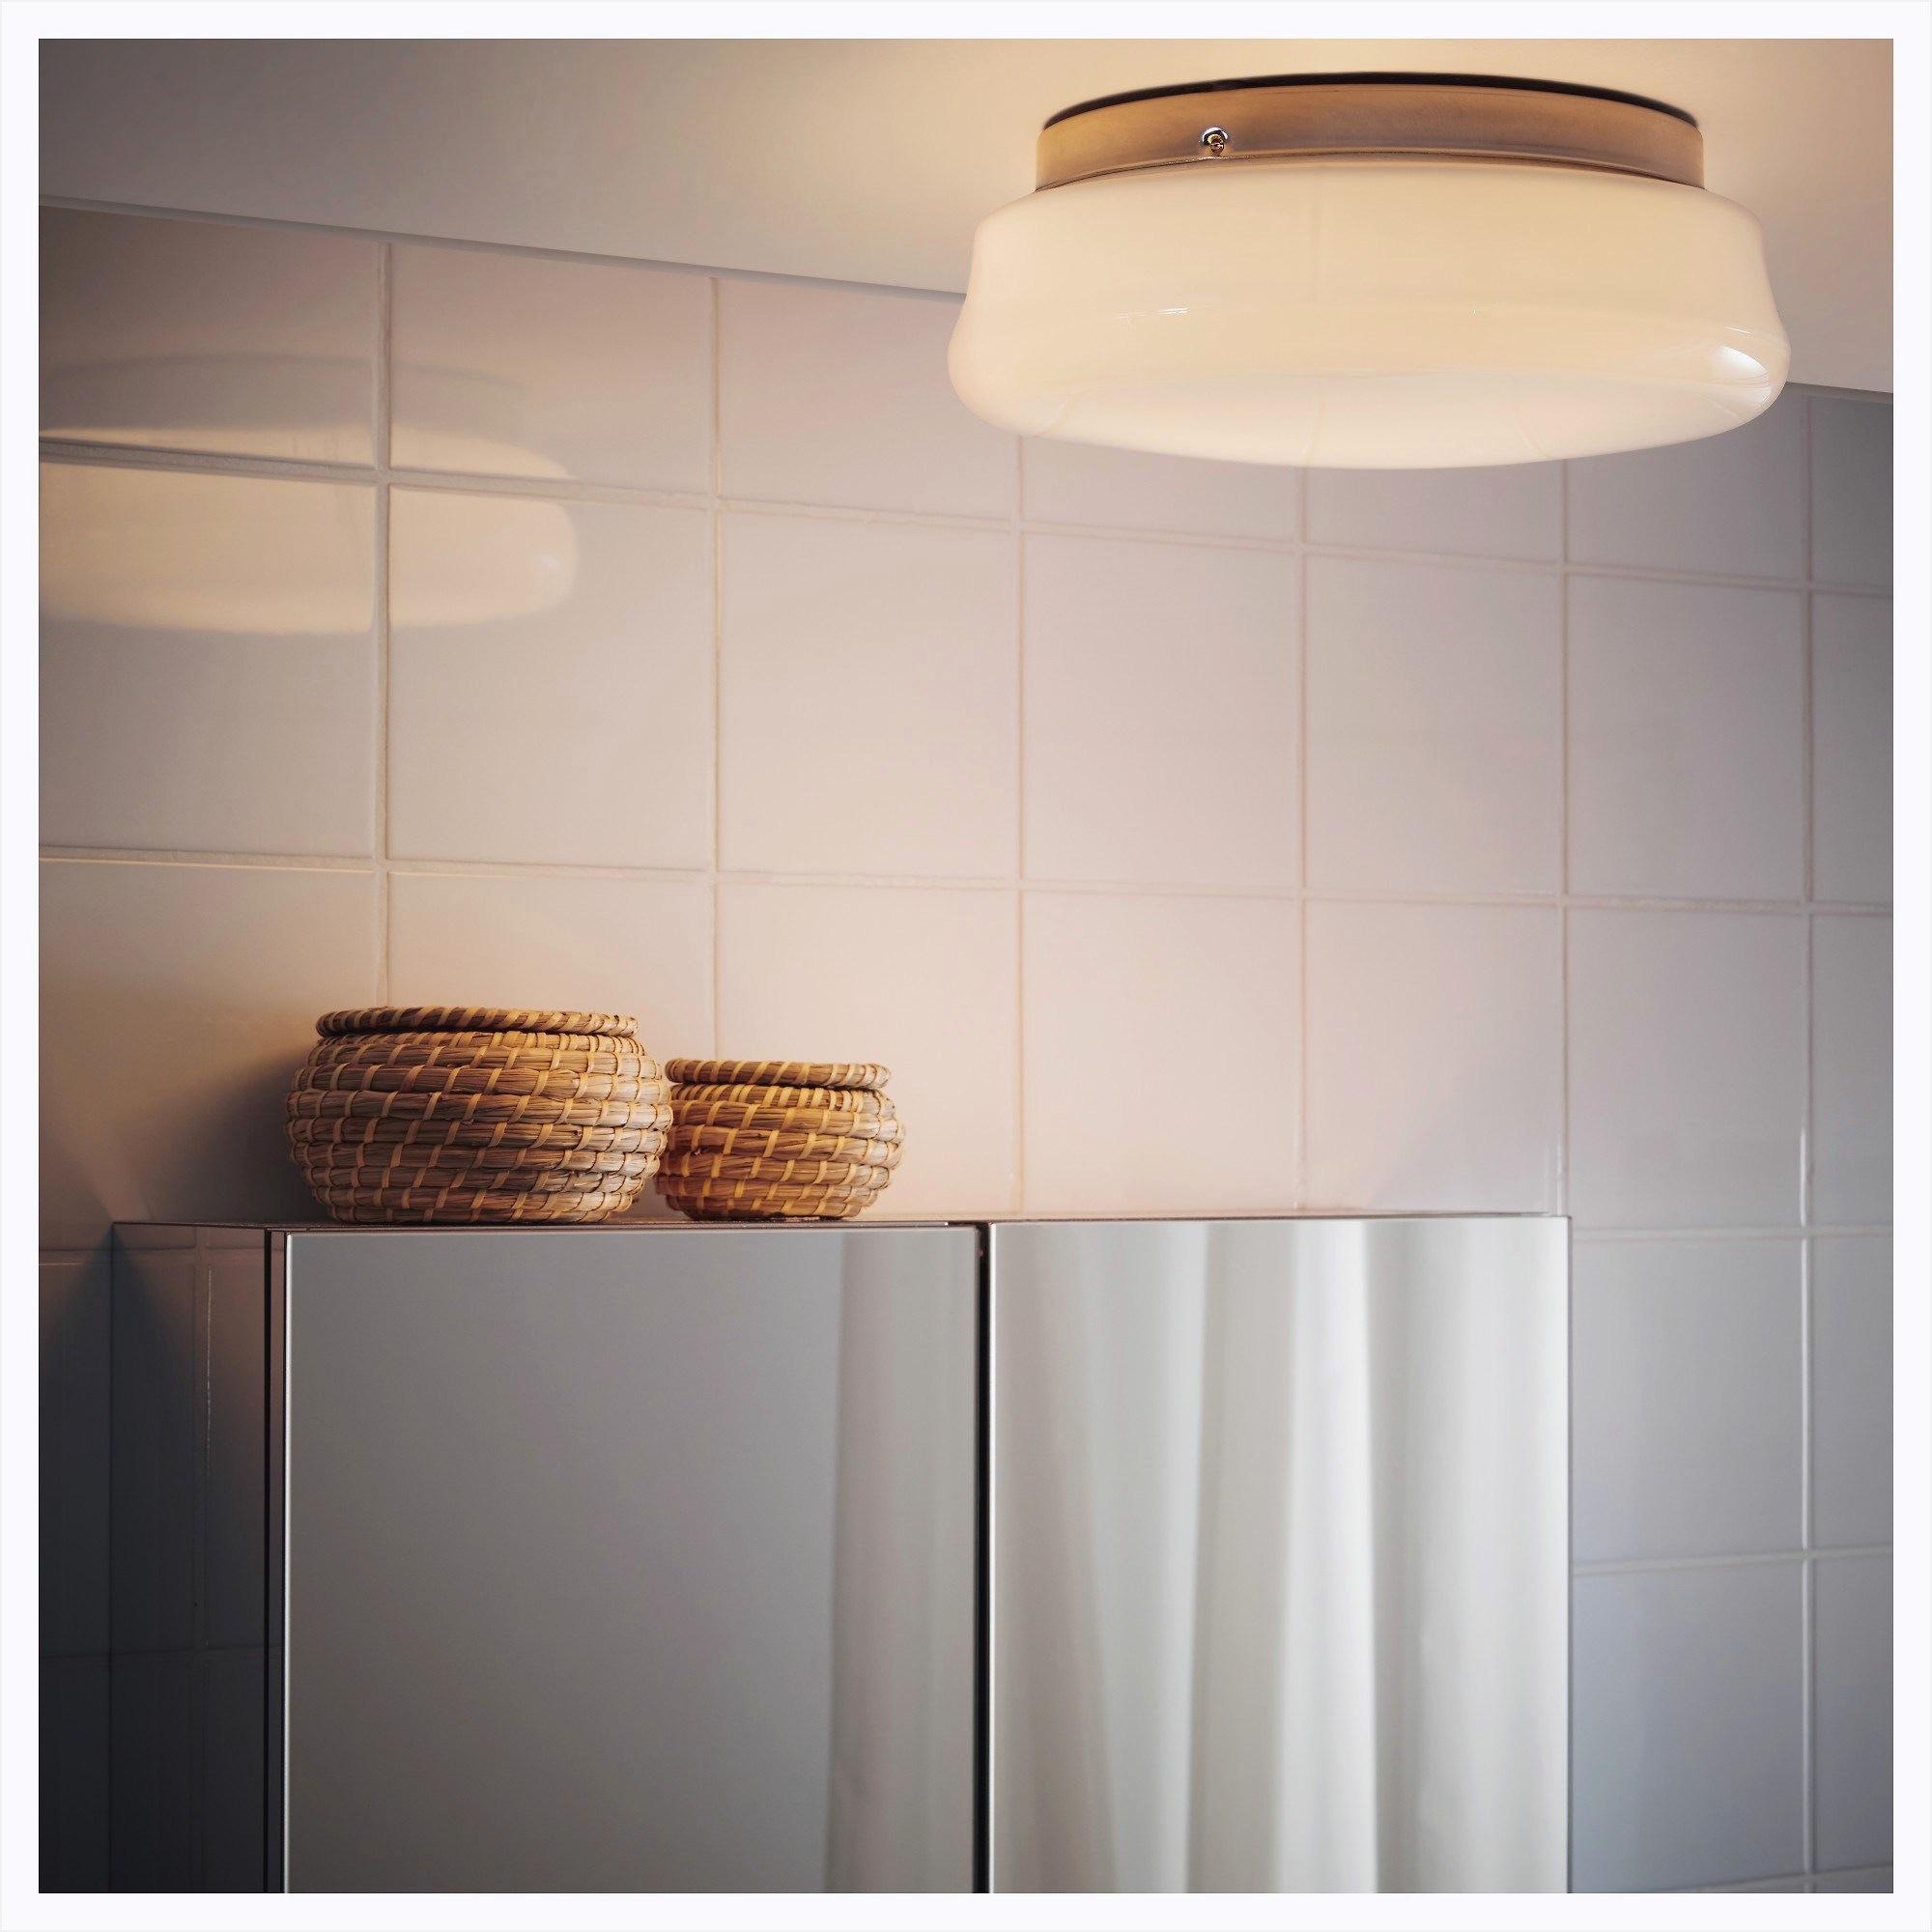 Eclairage salle de bain ikea beau photos plafonnier salle Eclairage salle de bain ikea